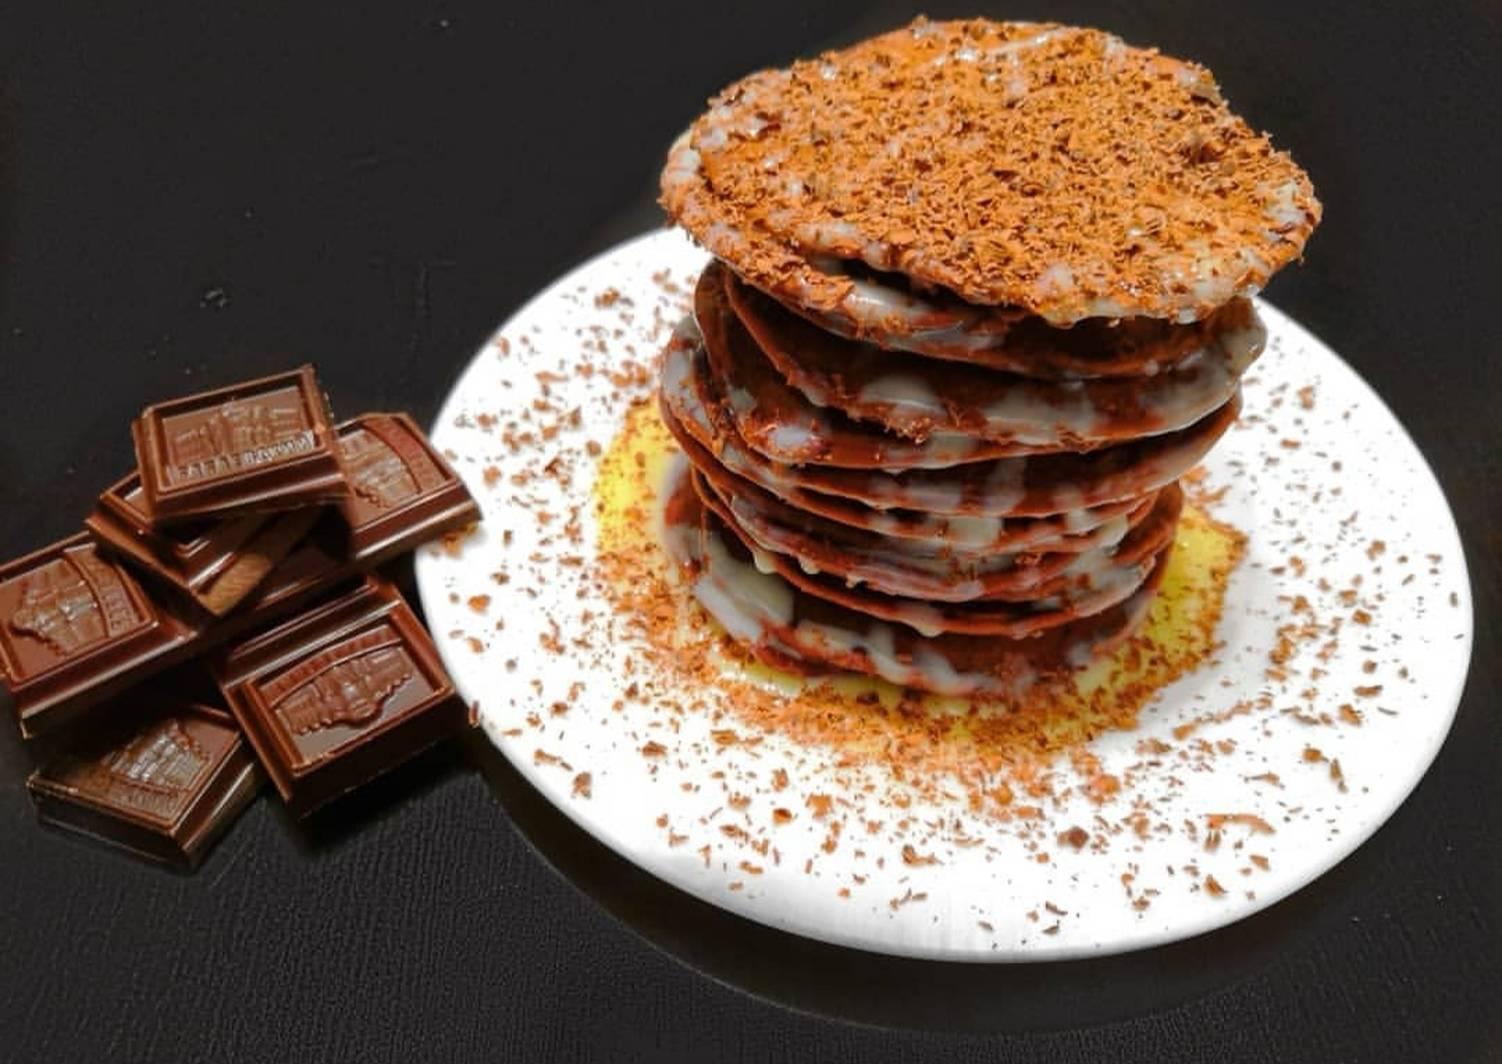 шоколадные оладушки рецепт пошагово с фото москве реальном